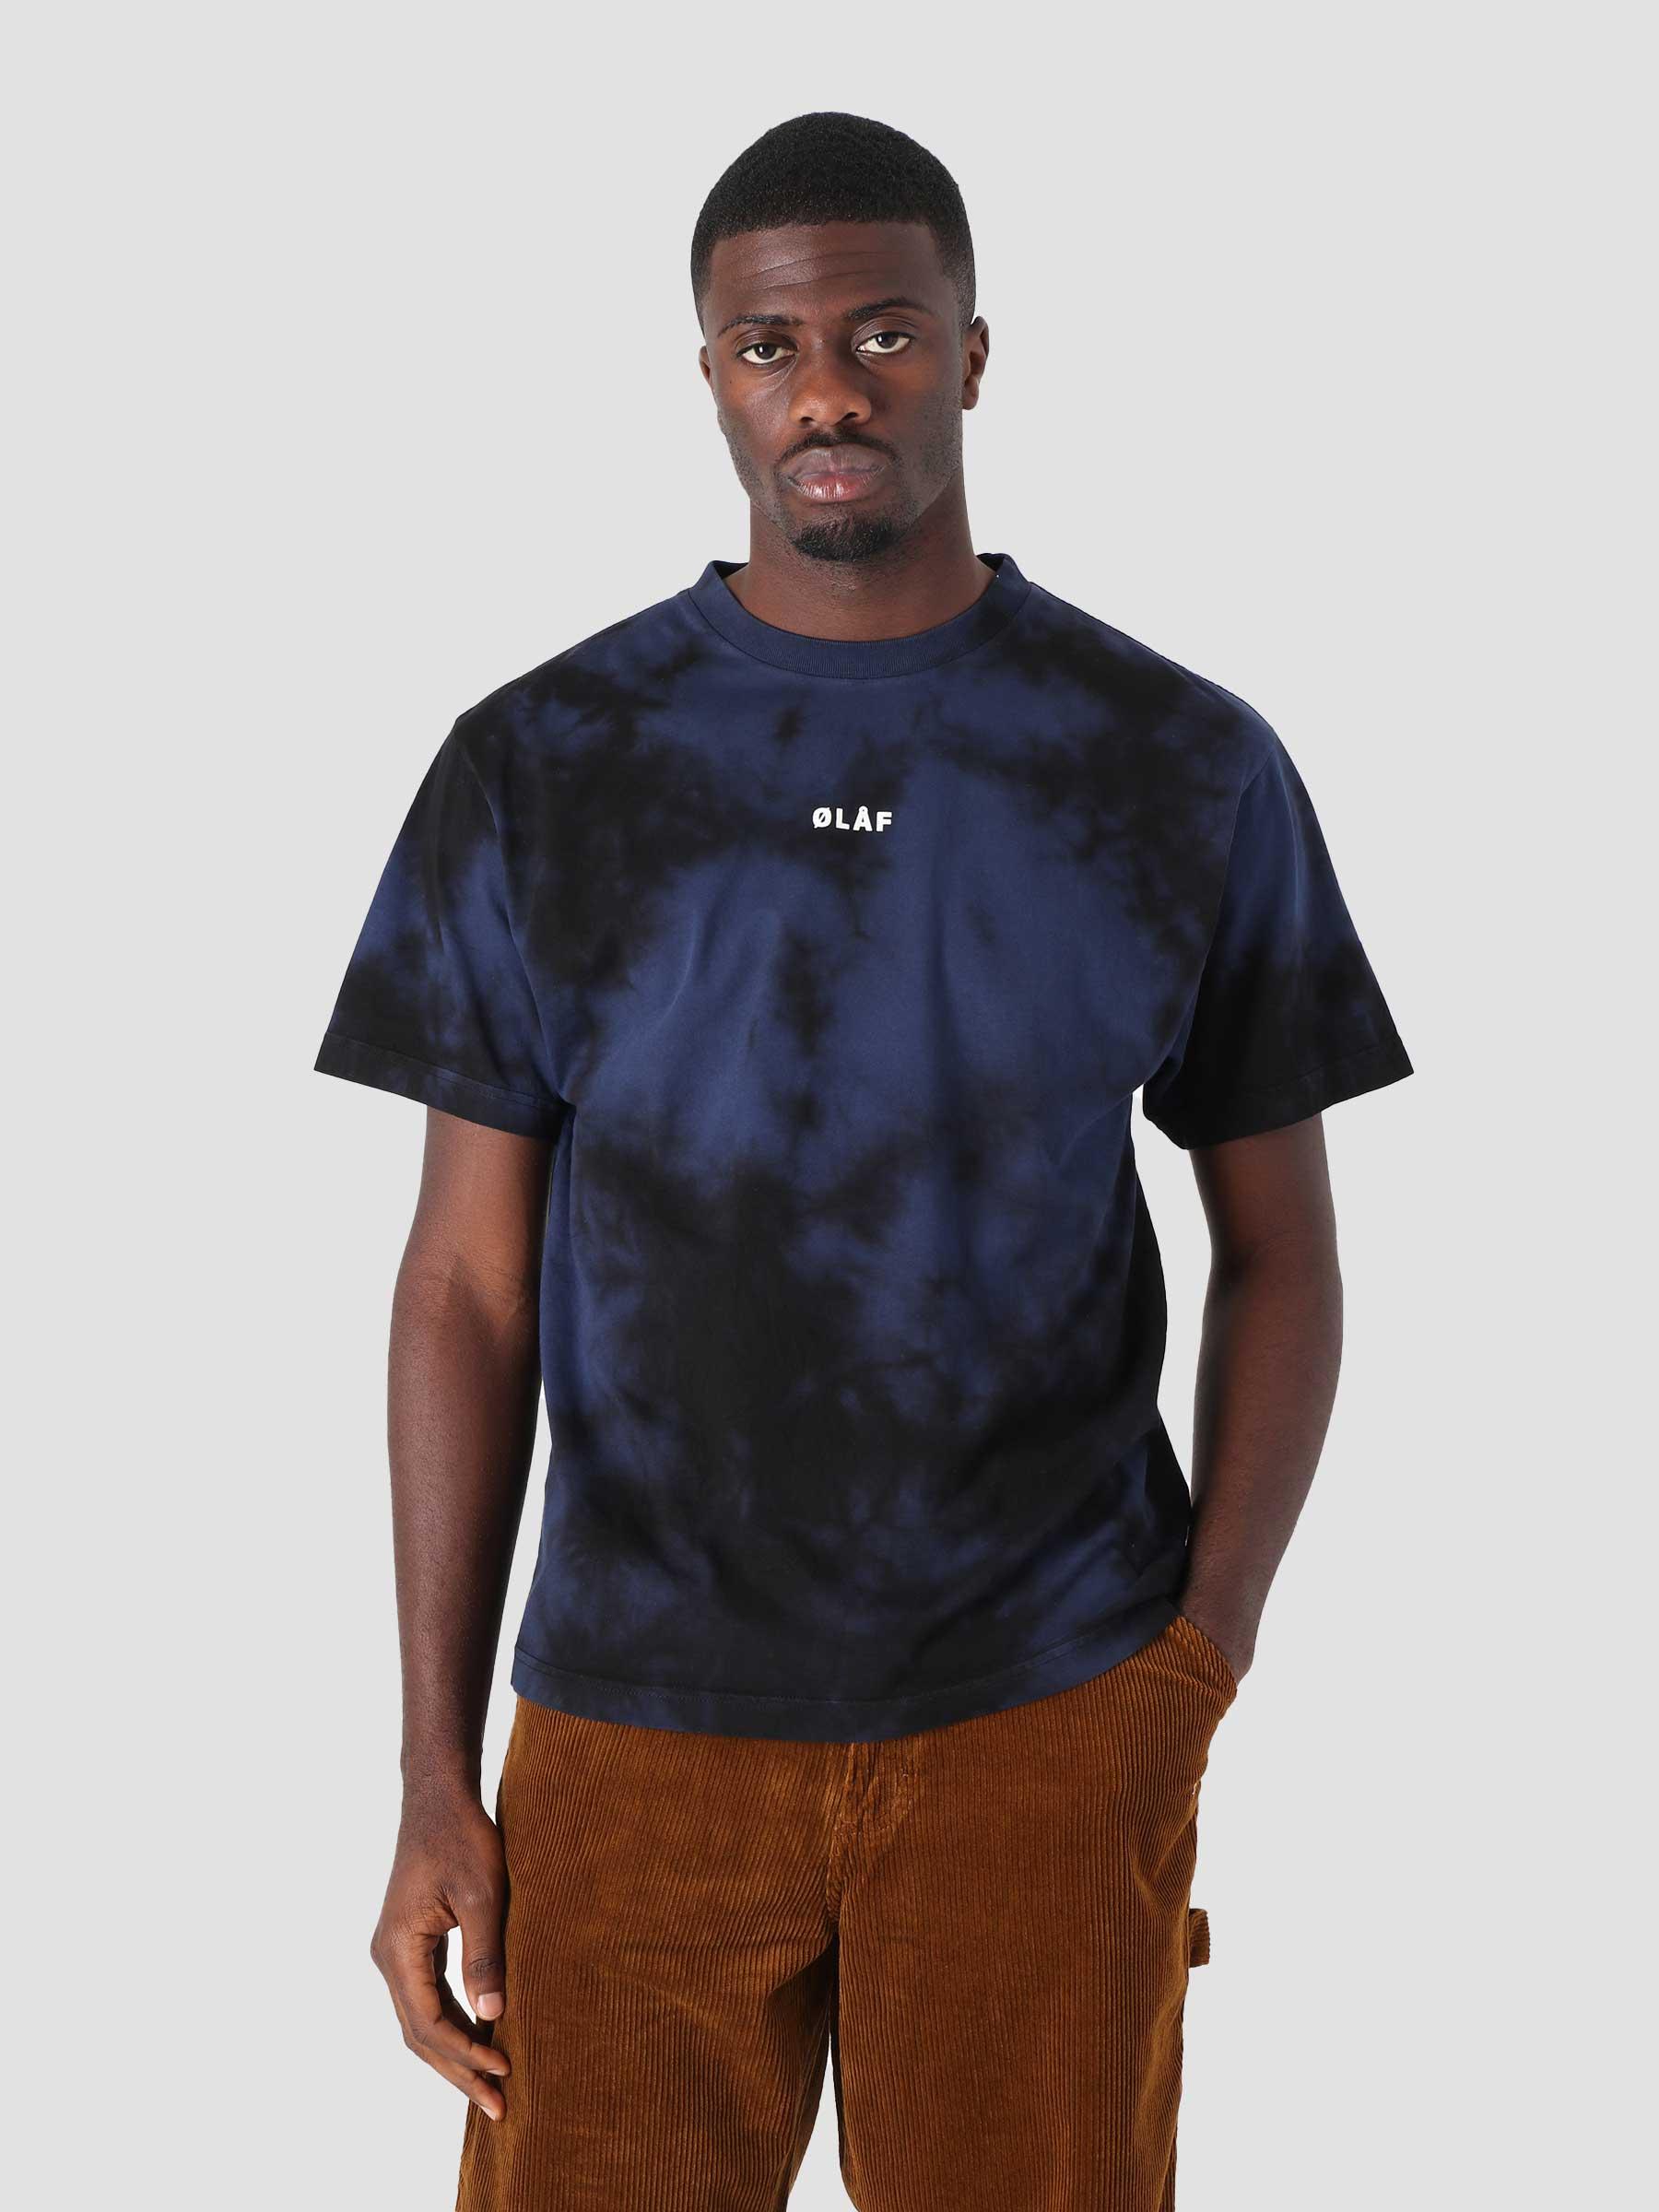 OLAF Tie Dye Block T-Shirt Black Blue